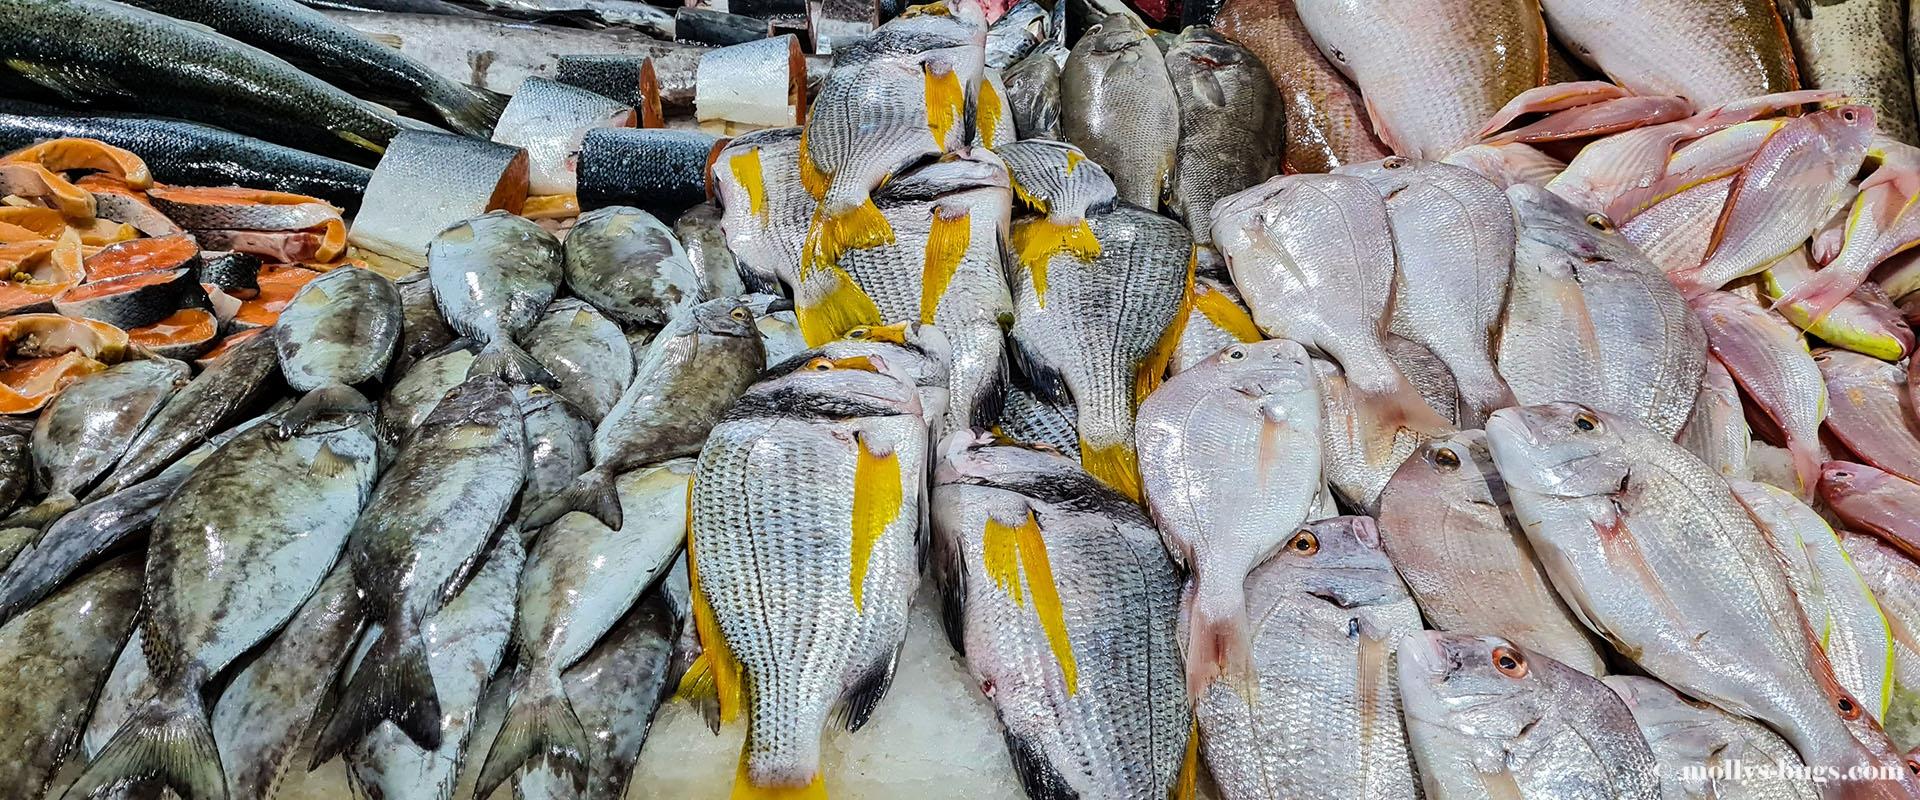 dubai-fish-market-1.jpg